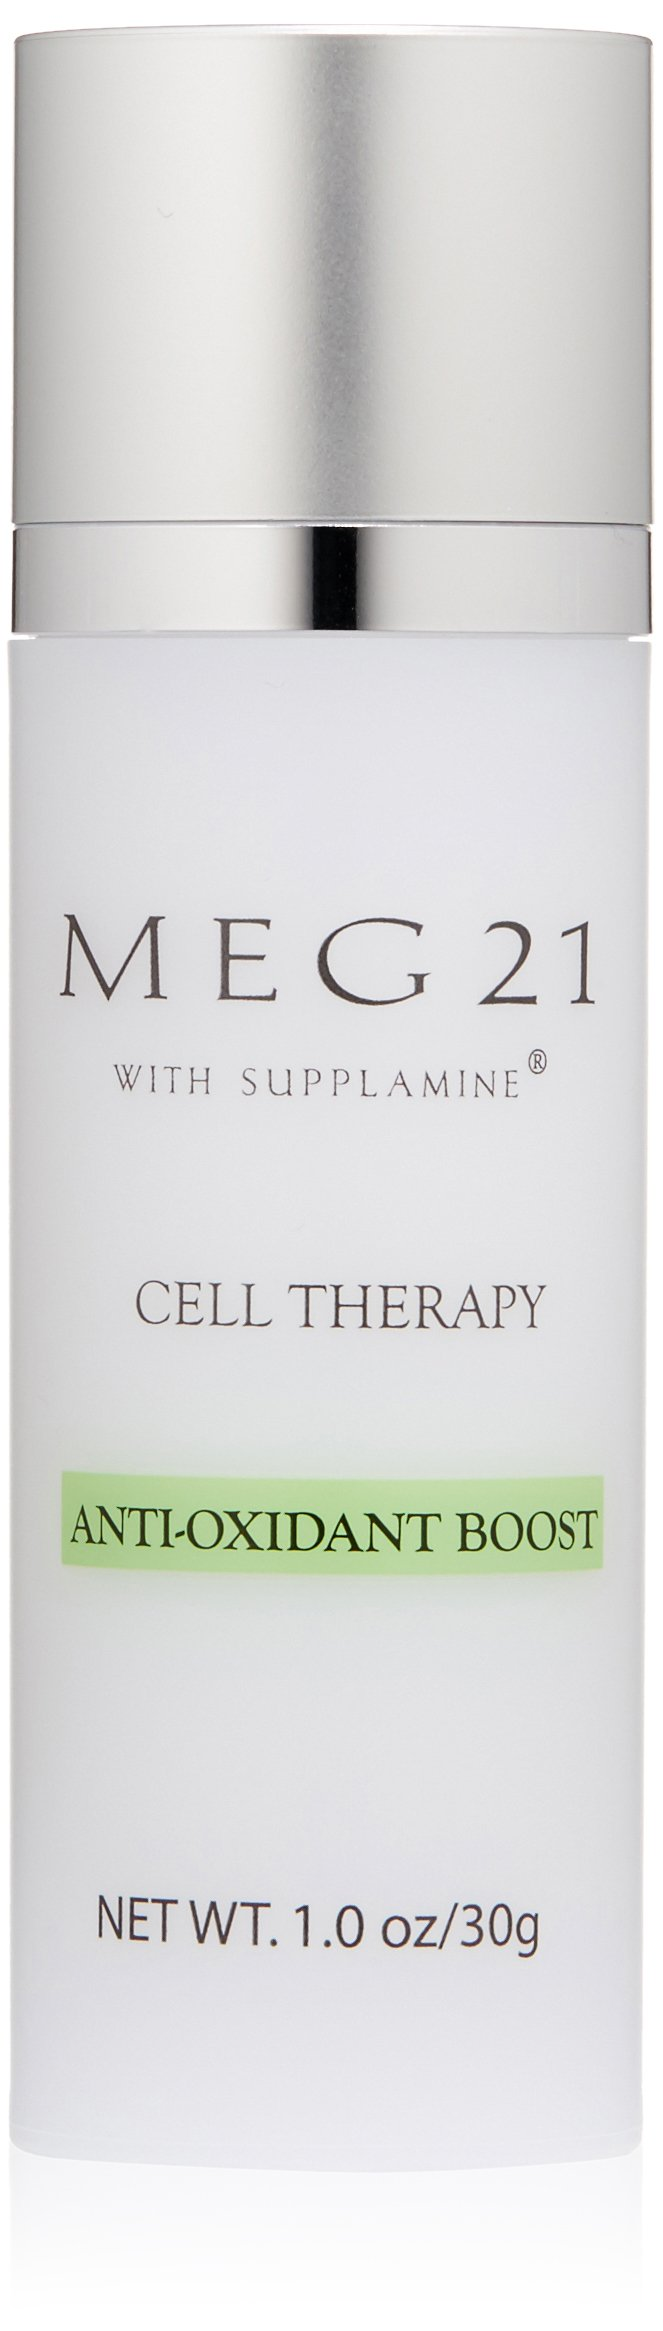 MEG 21 Cell Therapy Anti-Oxidant Boost Serum, 1 Oz